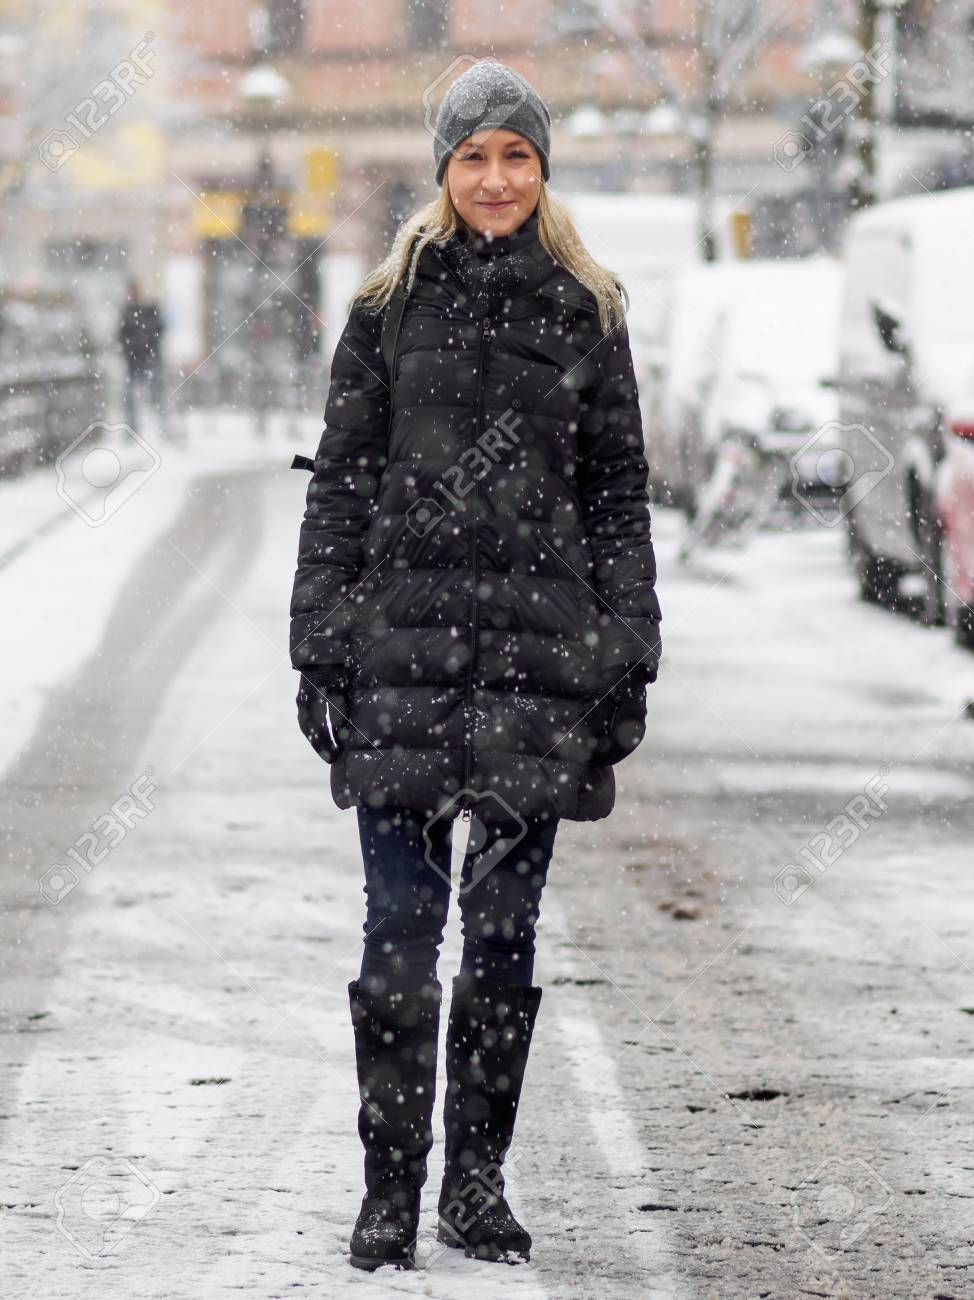 Blonde girl in the snow Standard-Bild - 91278205